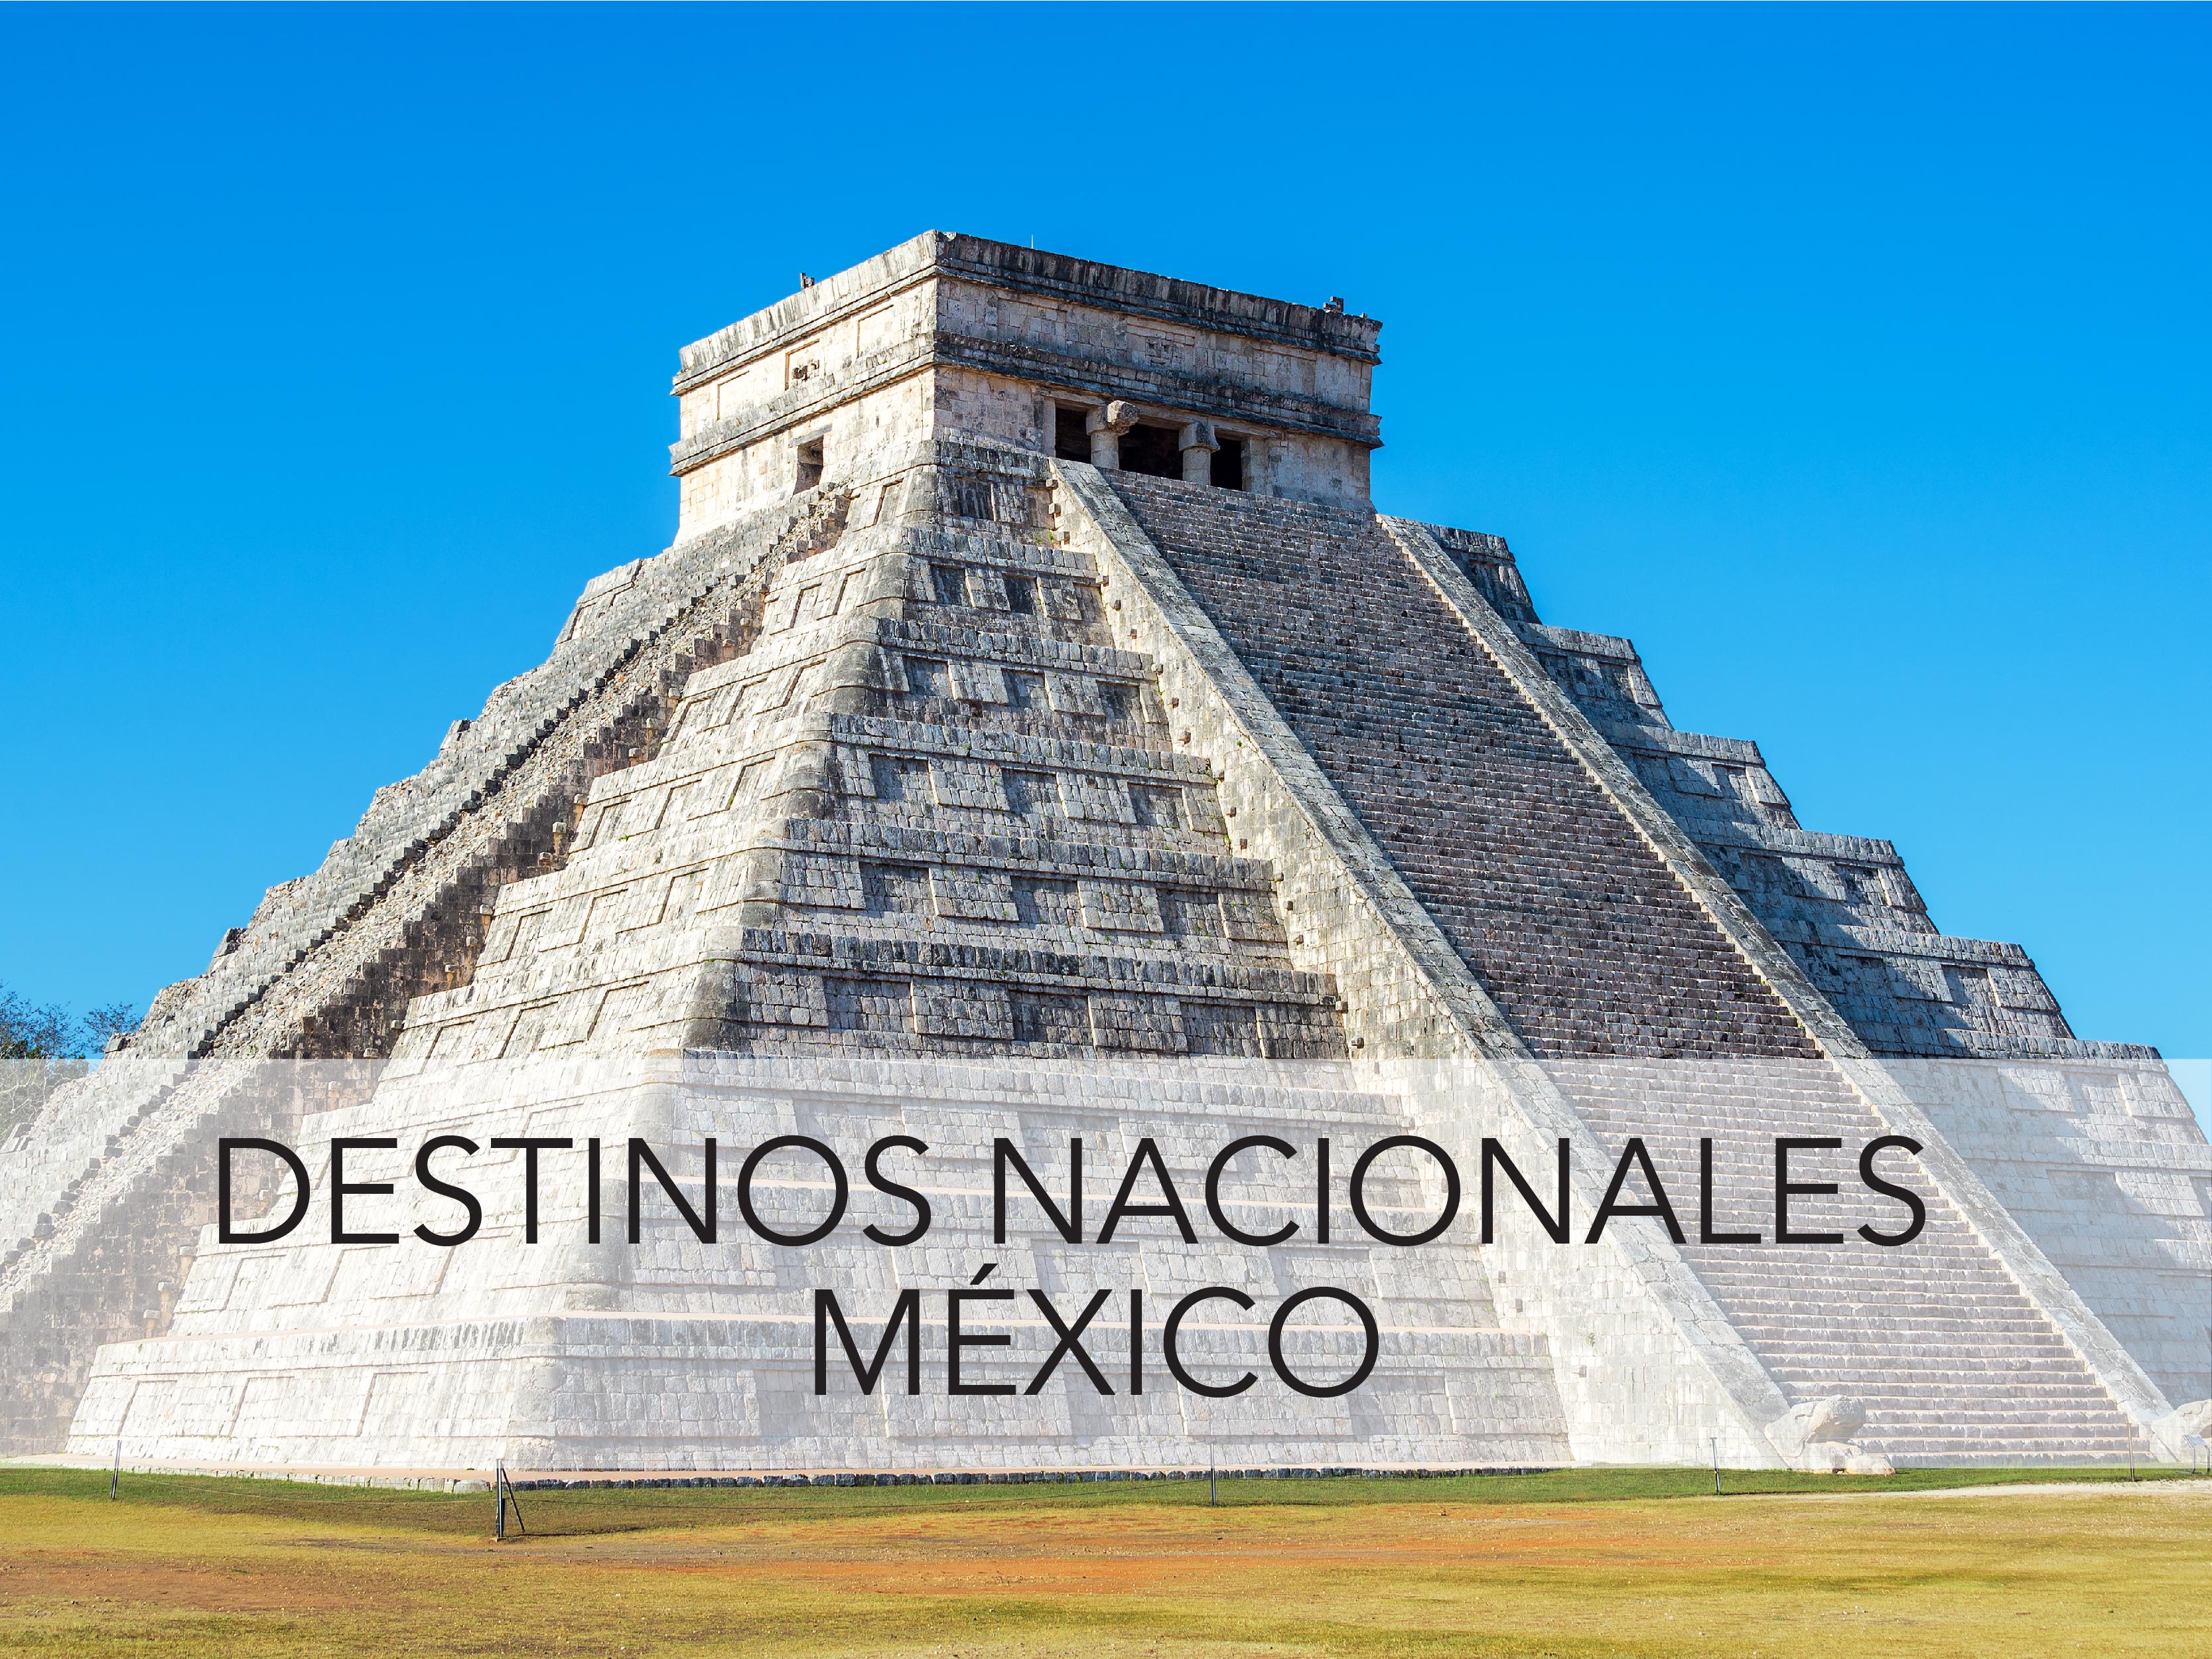 alt= Destinos nacionales méxico Fiesta tour